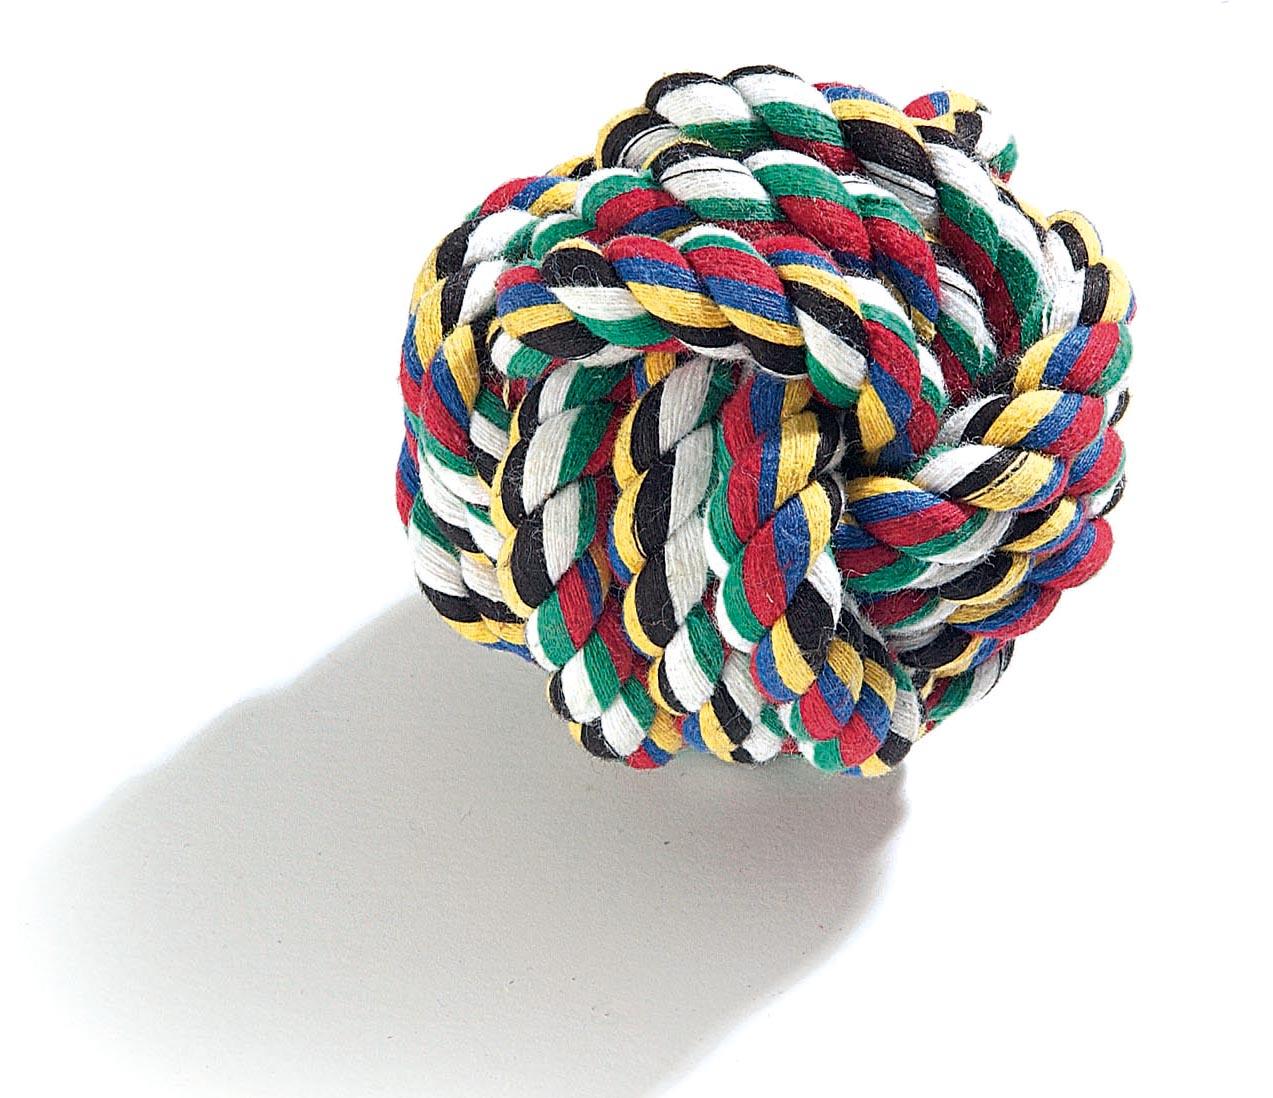 Игрушки из верёвки своими руками